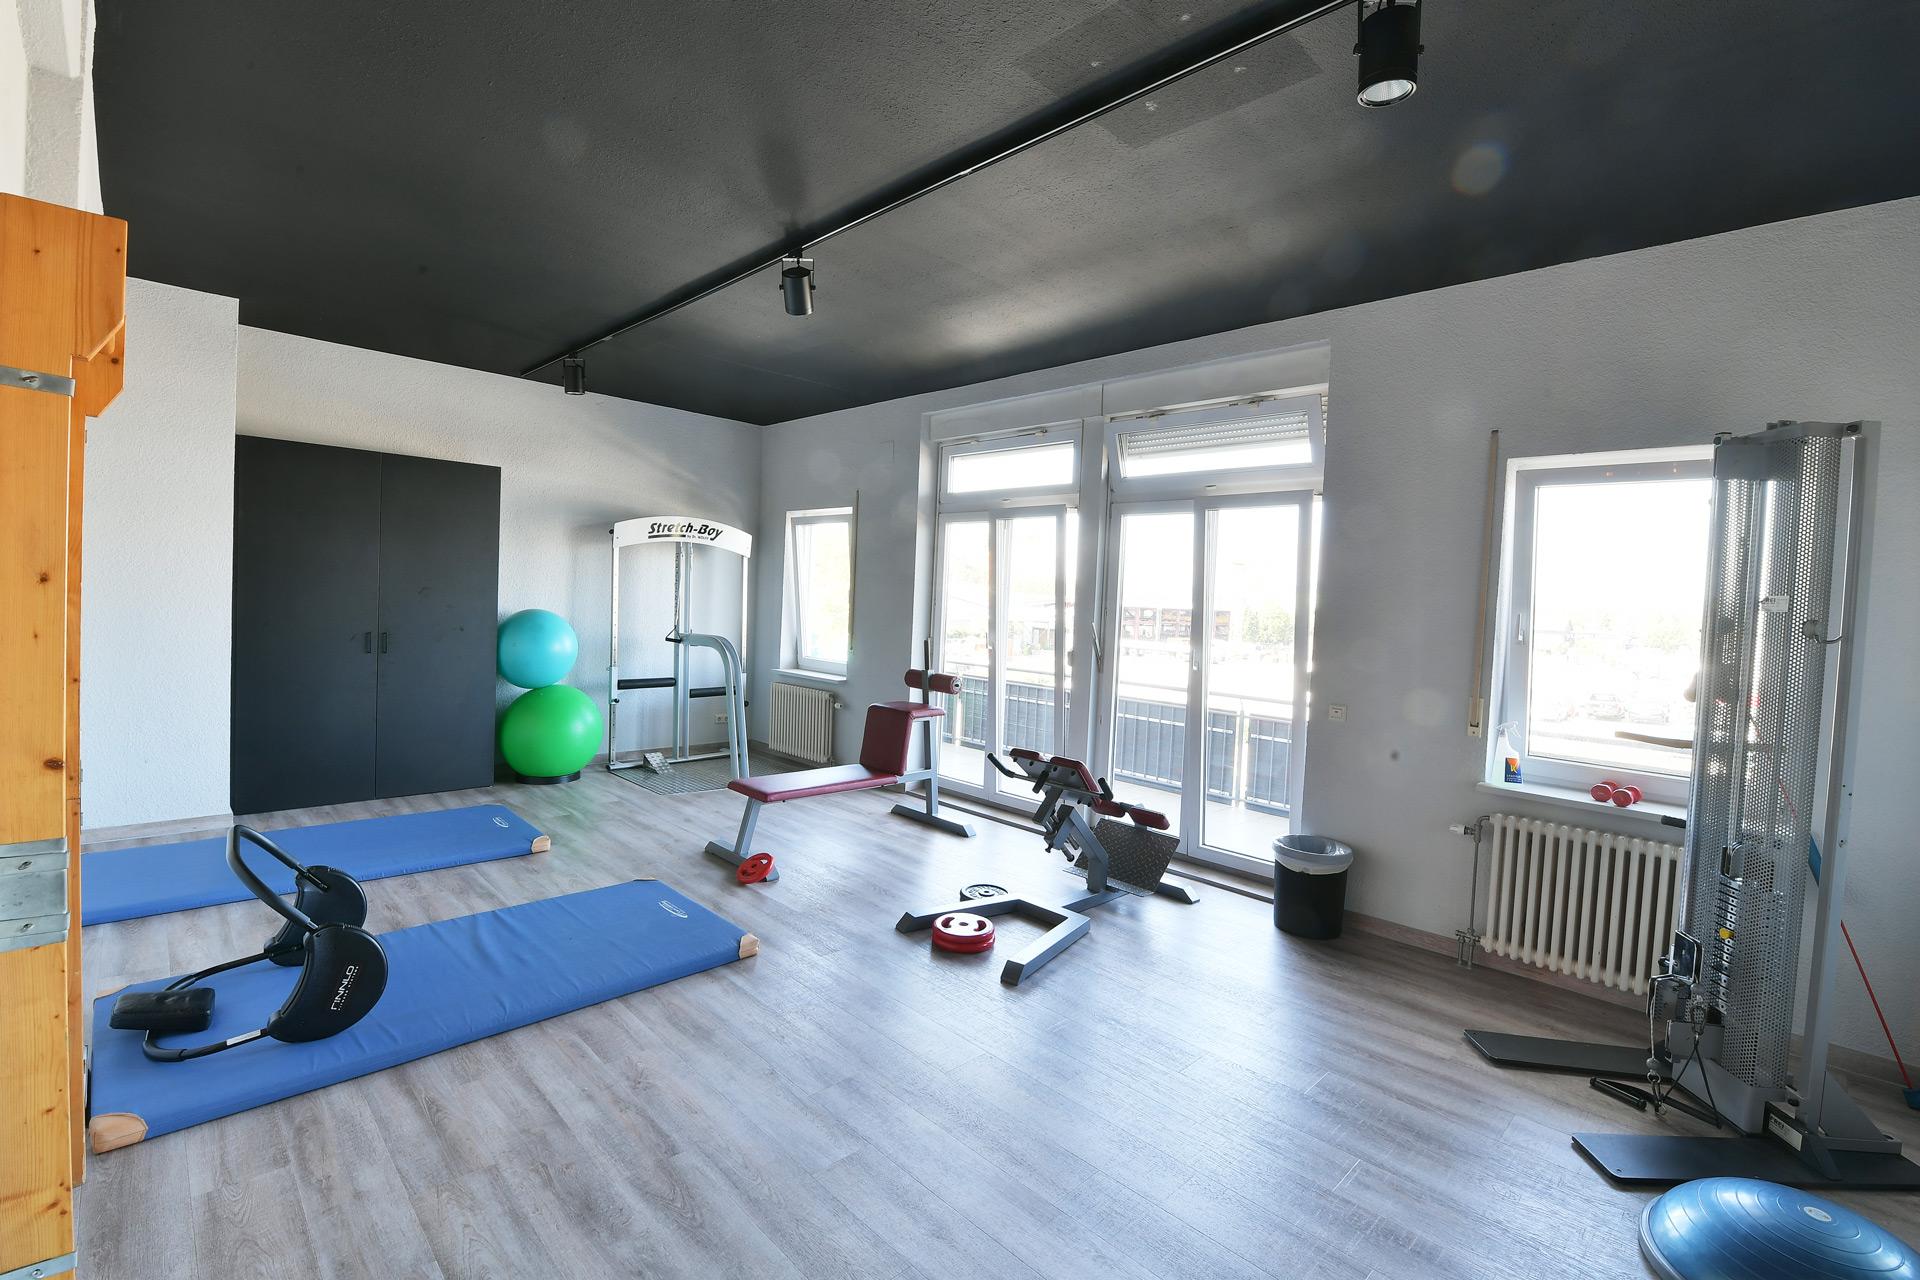 stretch-zone-sportpark-hugstetten-1920x1280px